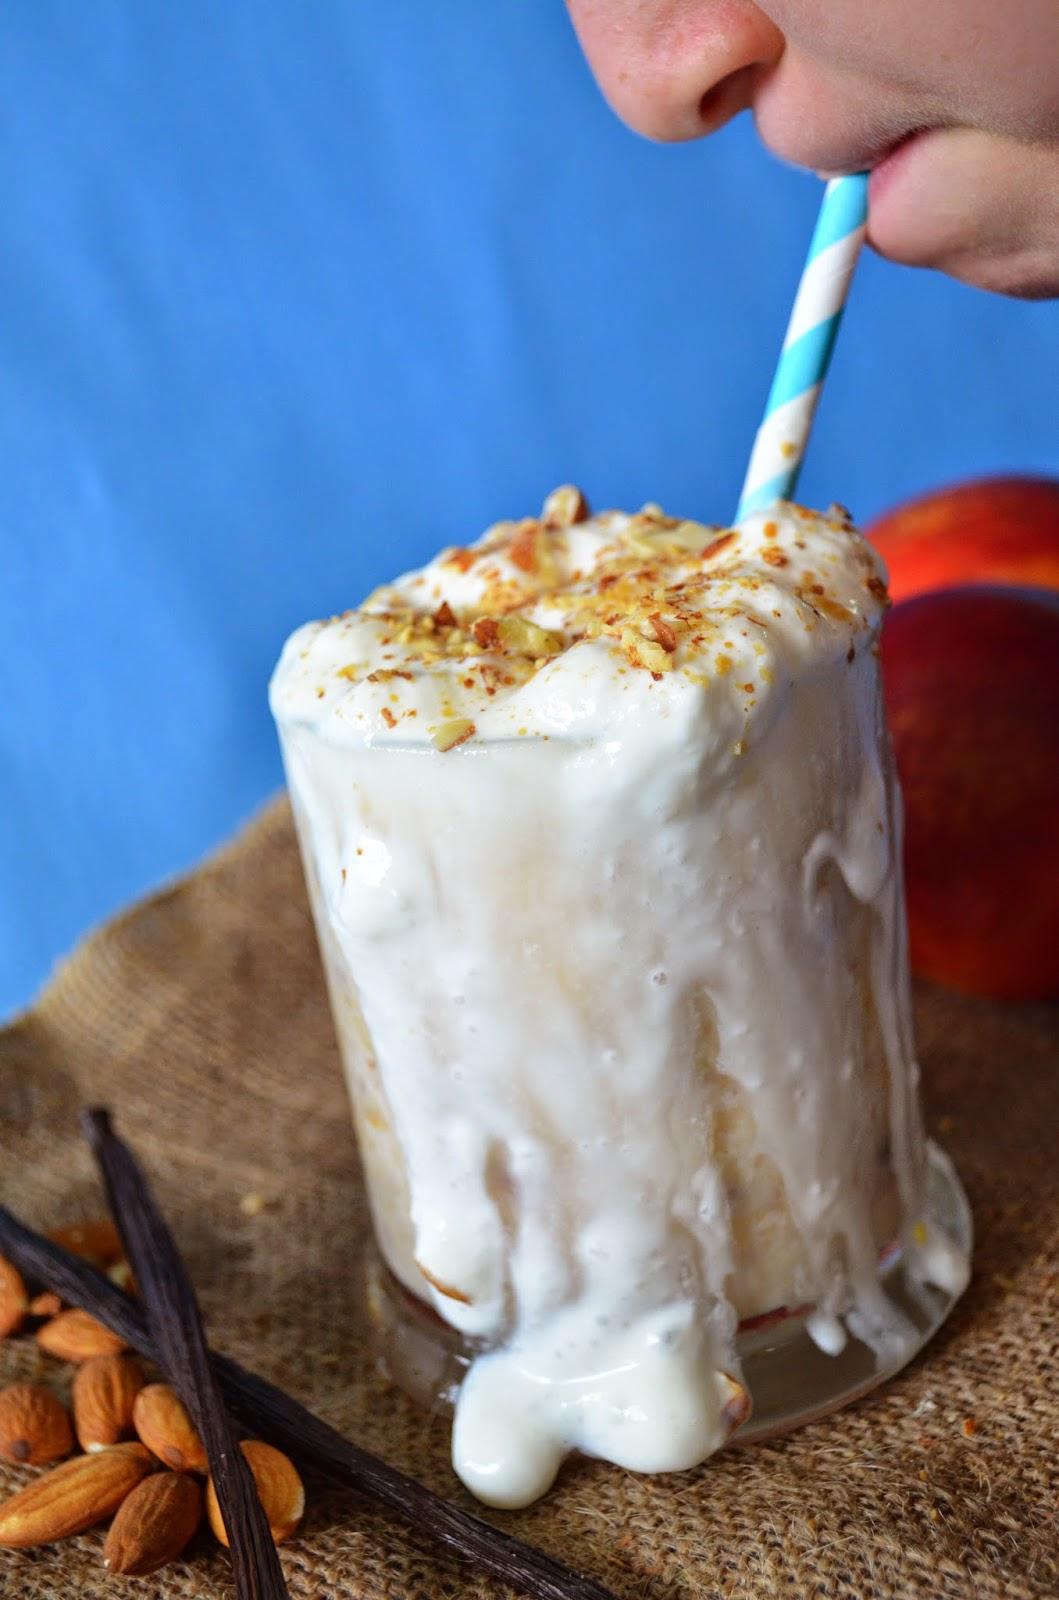 Vanilla Almond Nectarine Milkshake from Hi! It's Jilly #MyRocketShake